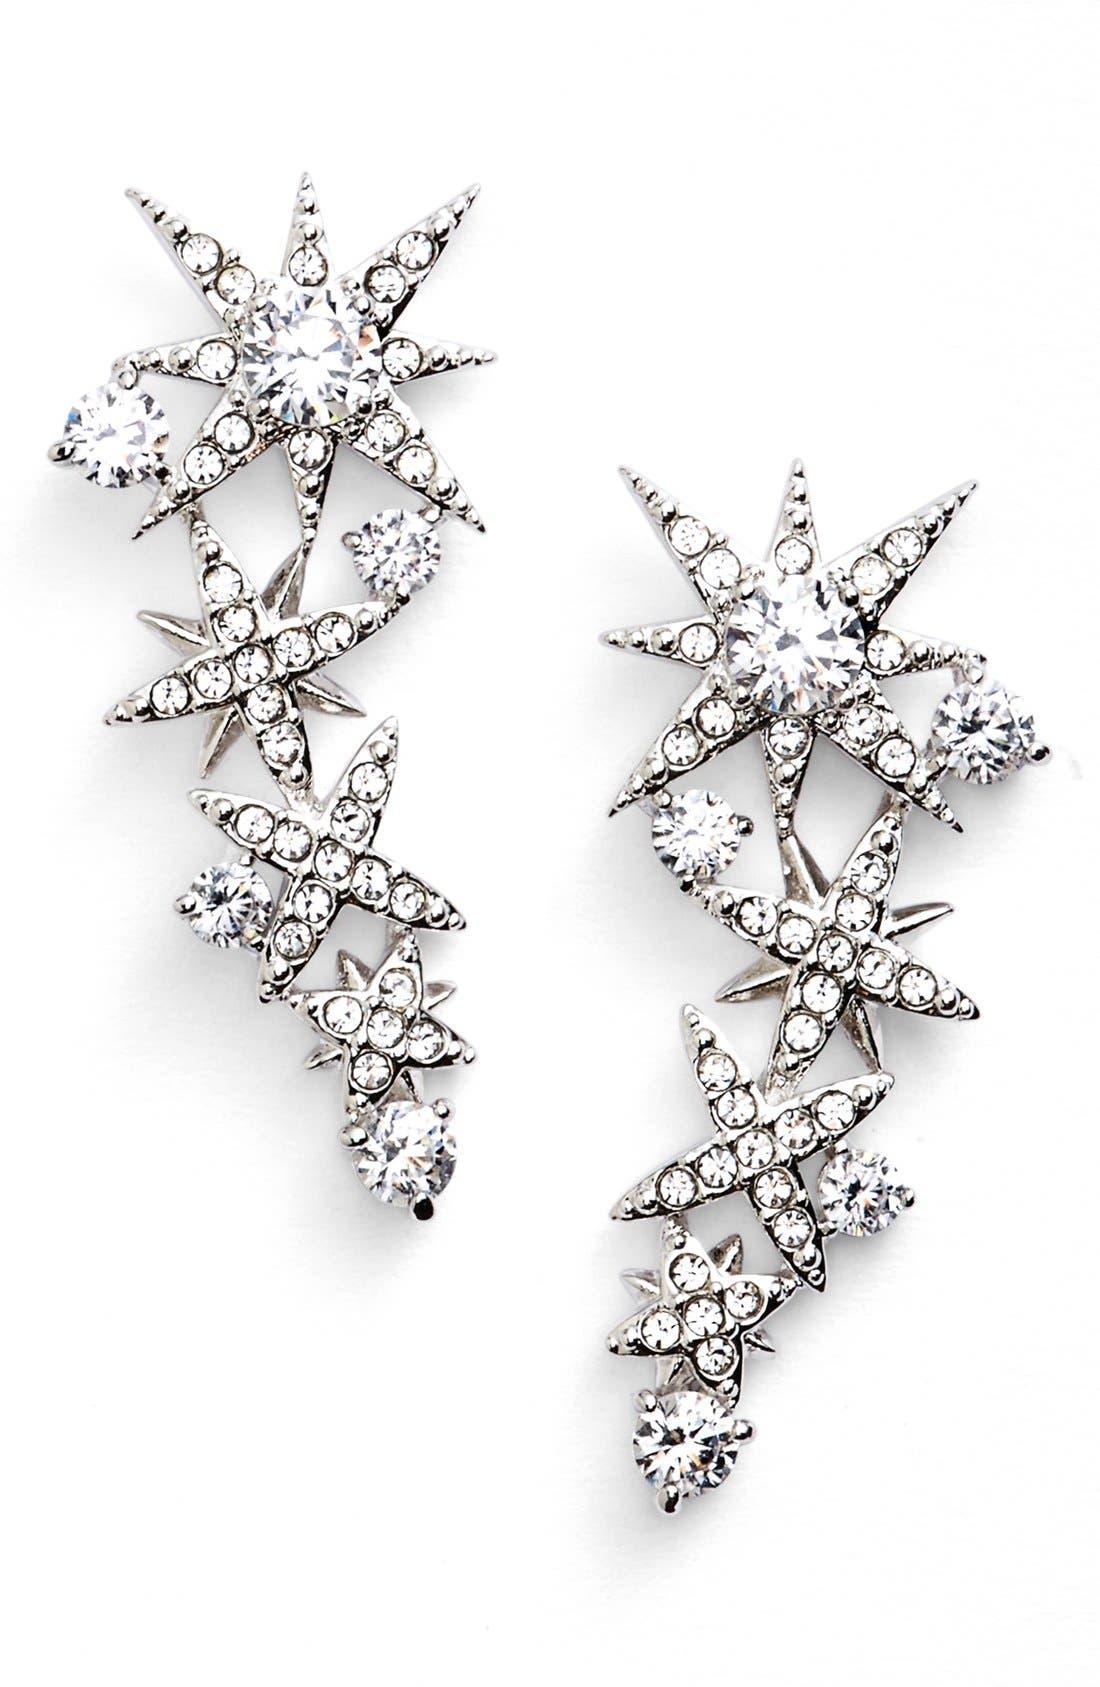 Alternate Image 1 Selected - Nadri'Starry Night' Linear Stud Earrings